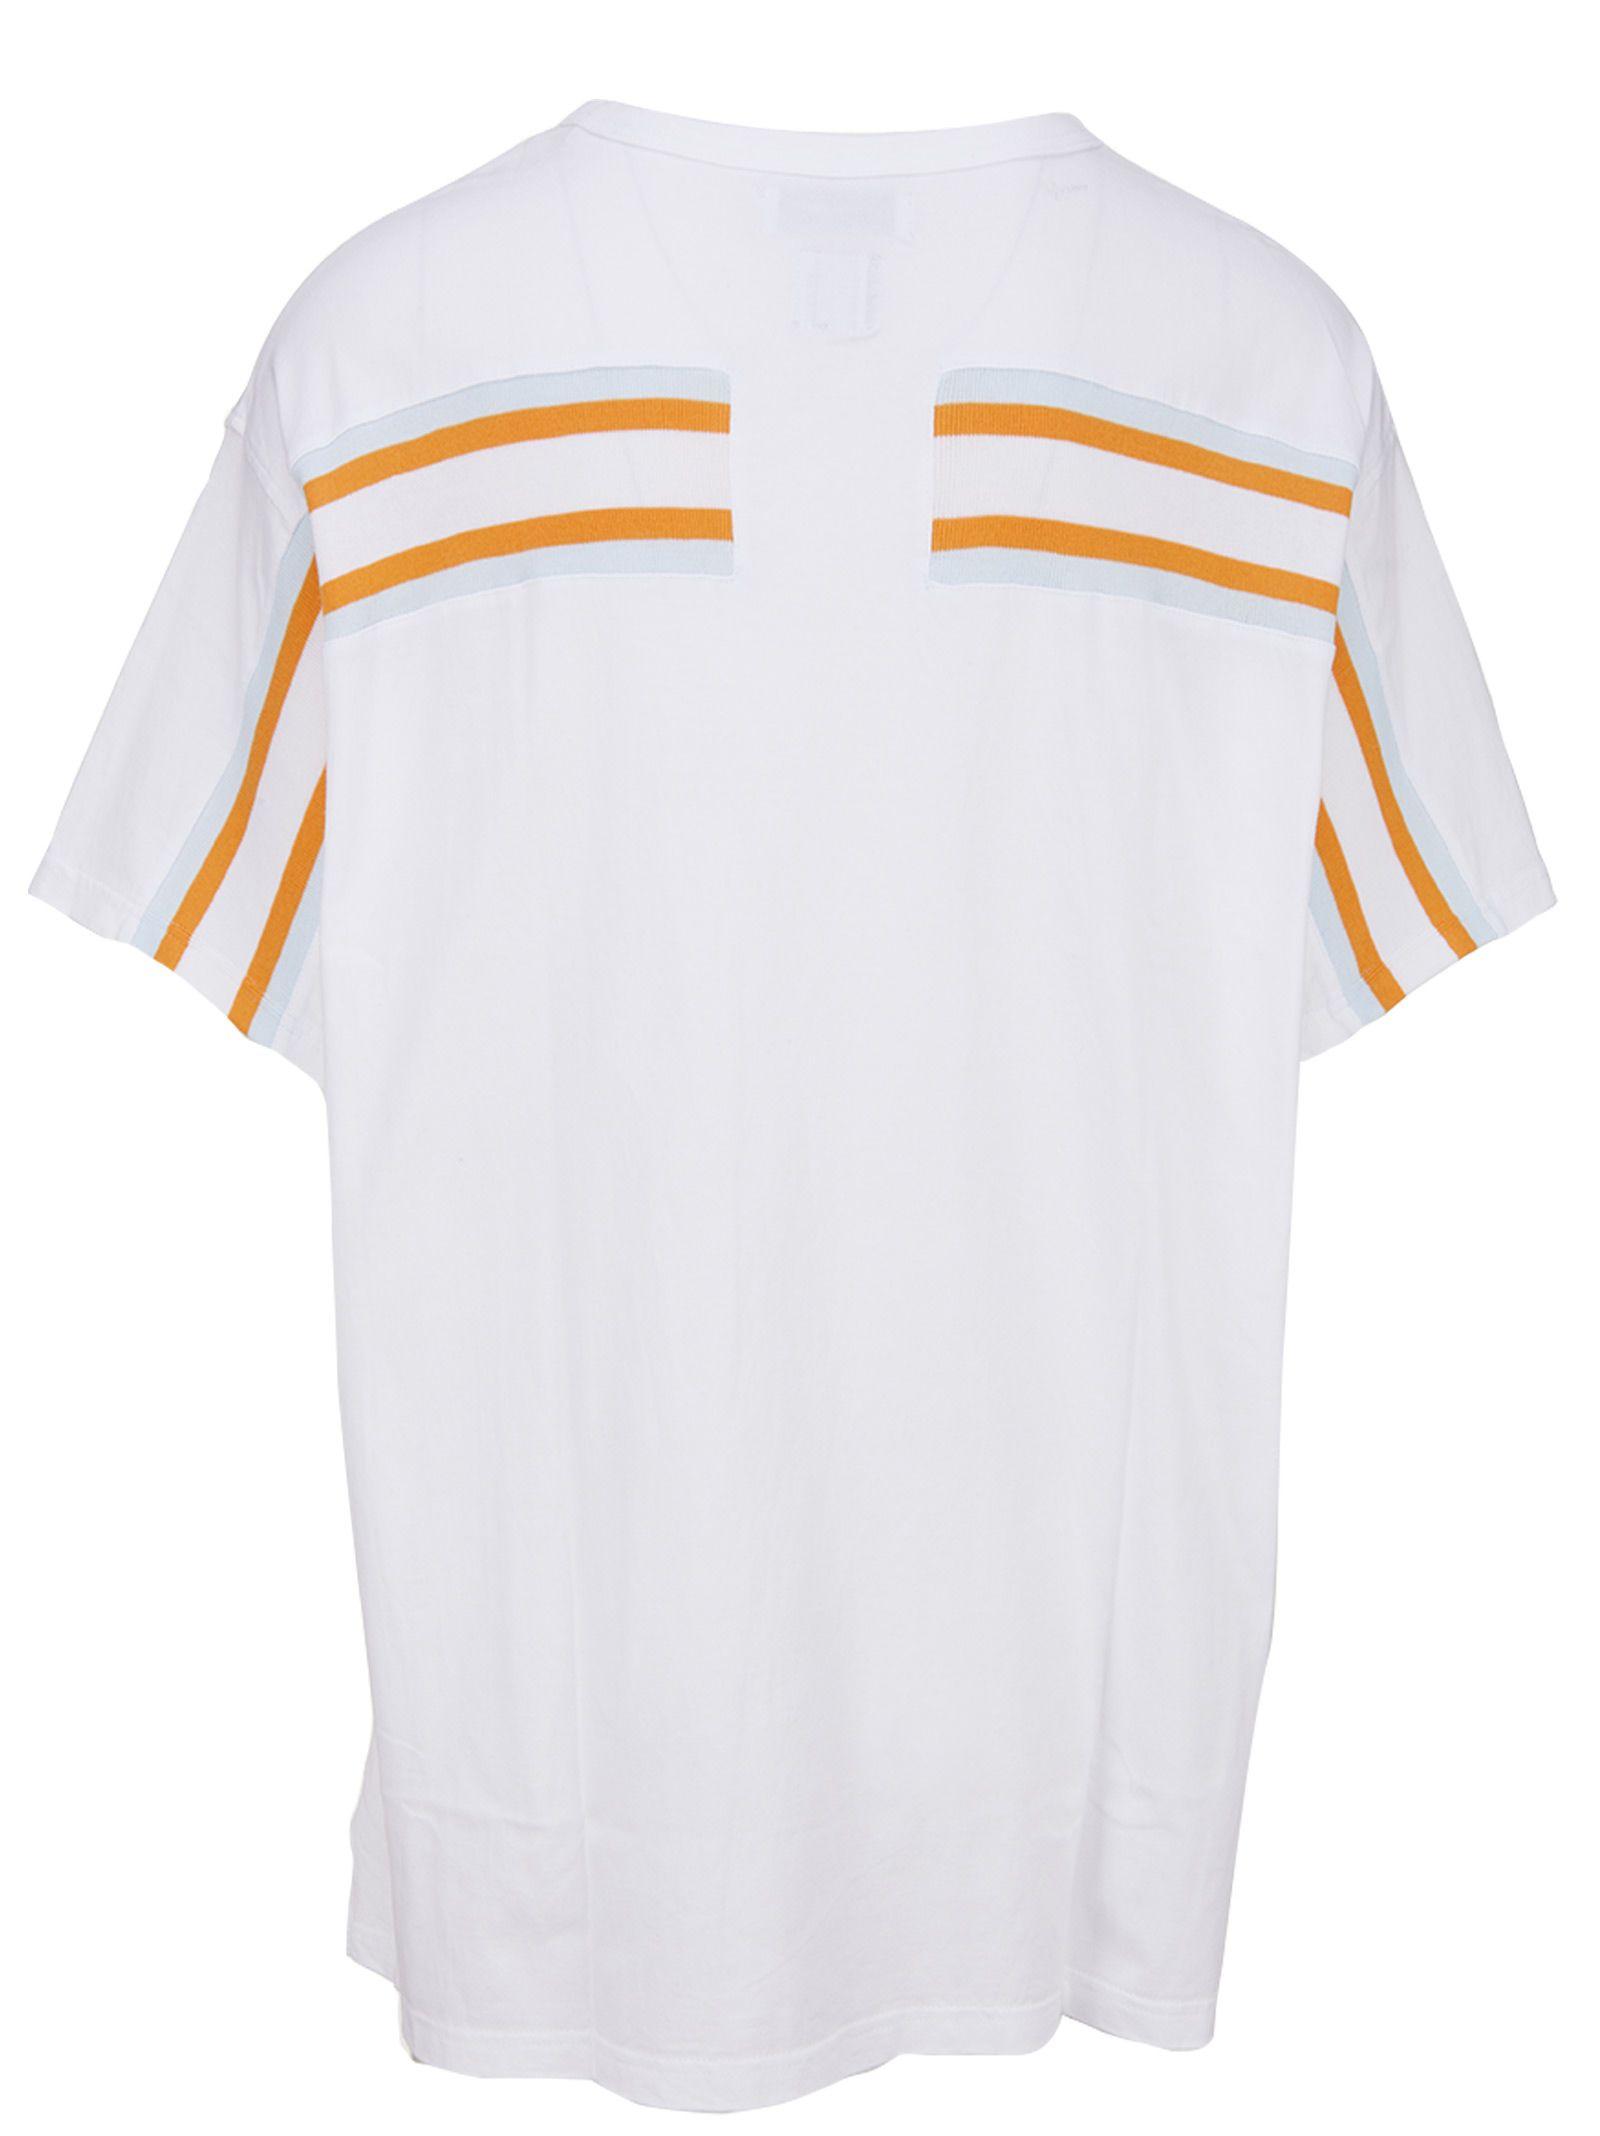 TOPWEAR - T-shirts Facetasm Sale Sast wKMlcY1j